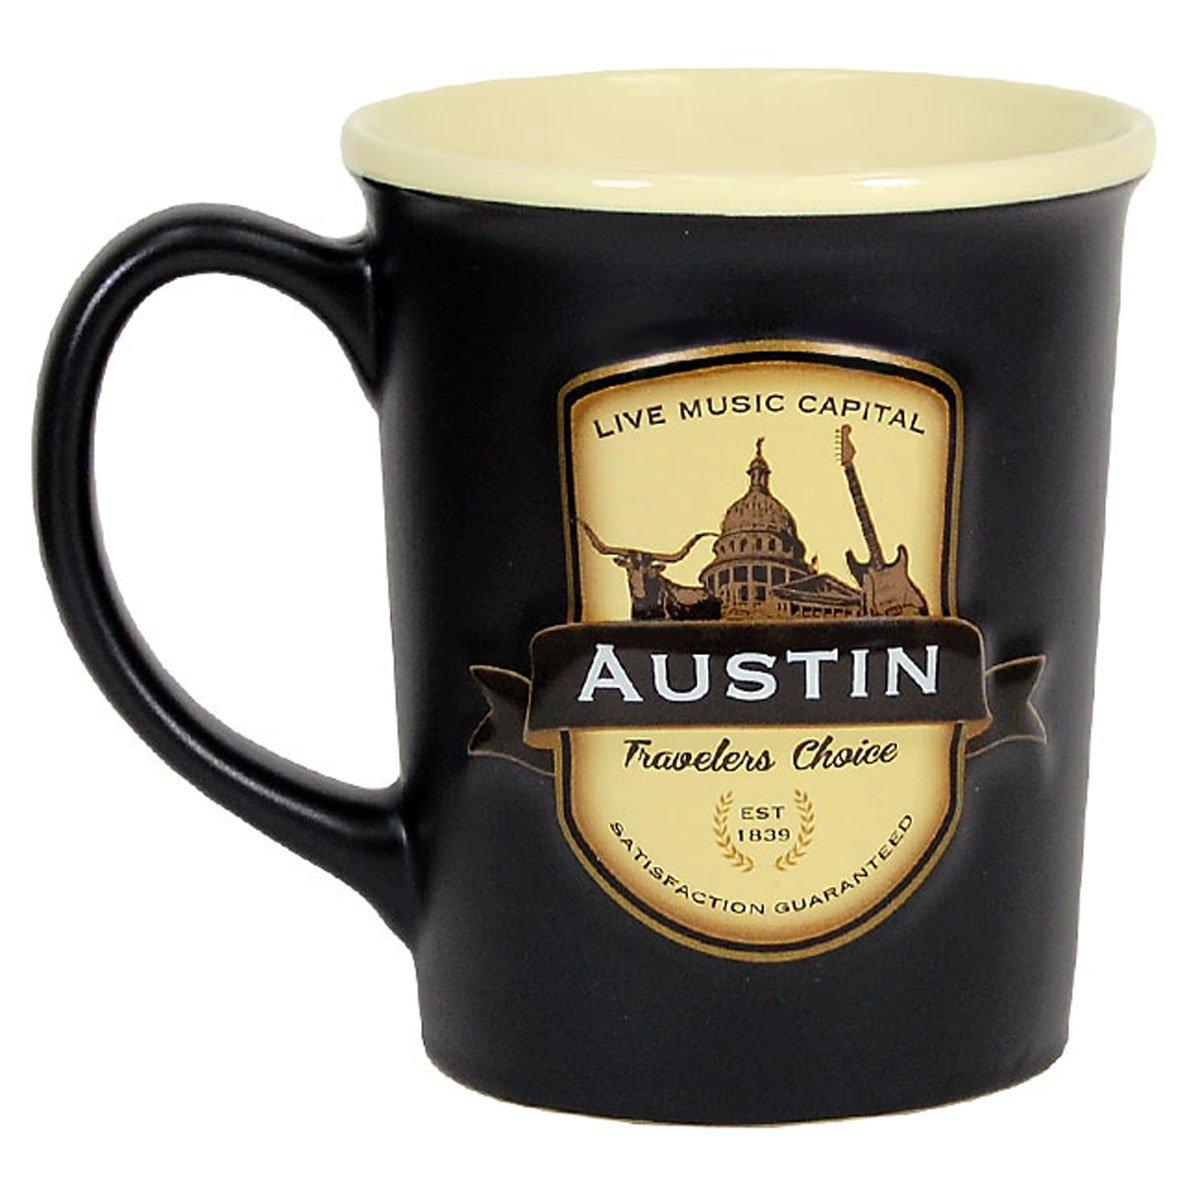 Austin Texas the Live Music Capital of the World Mug